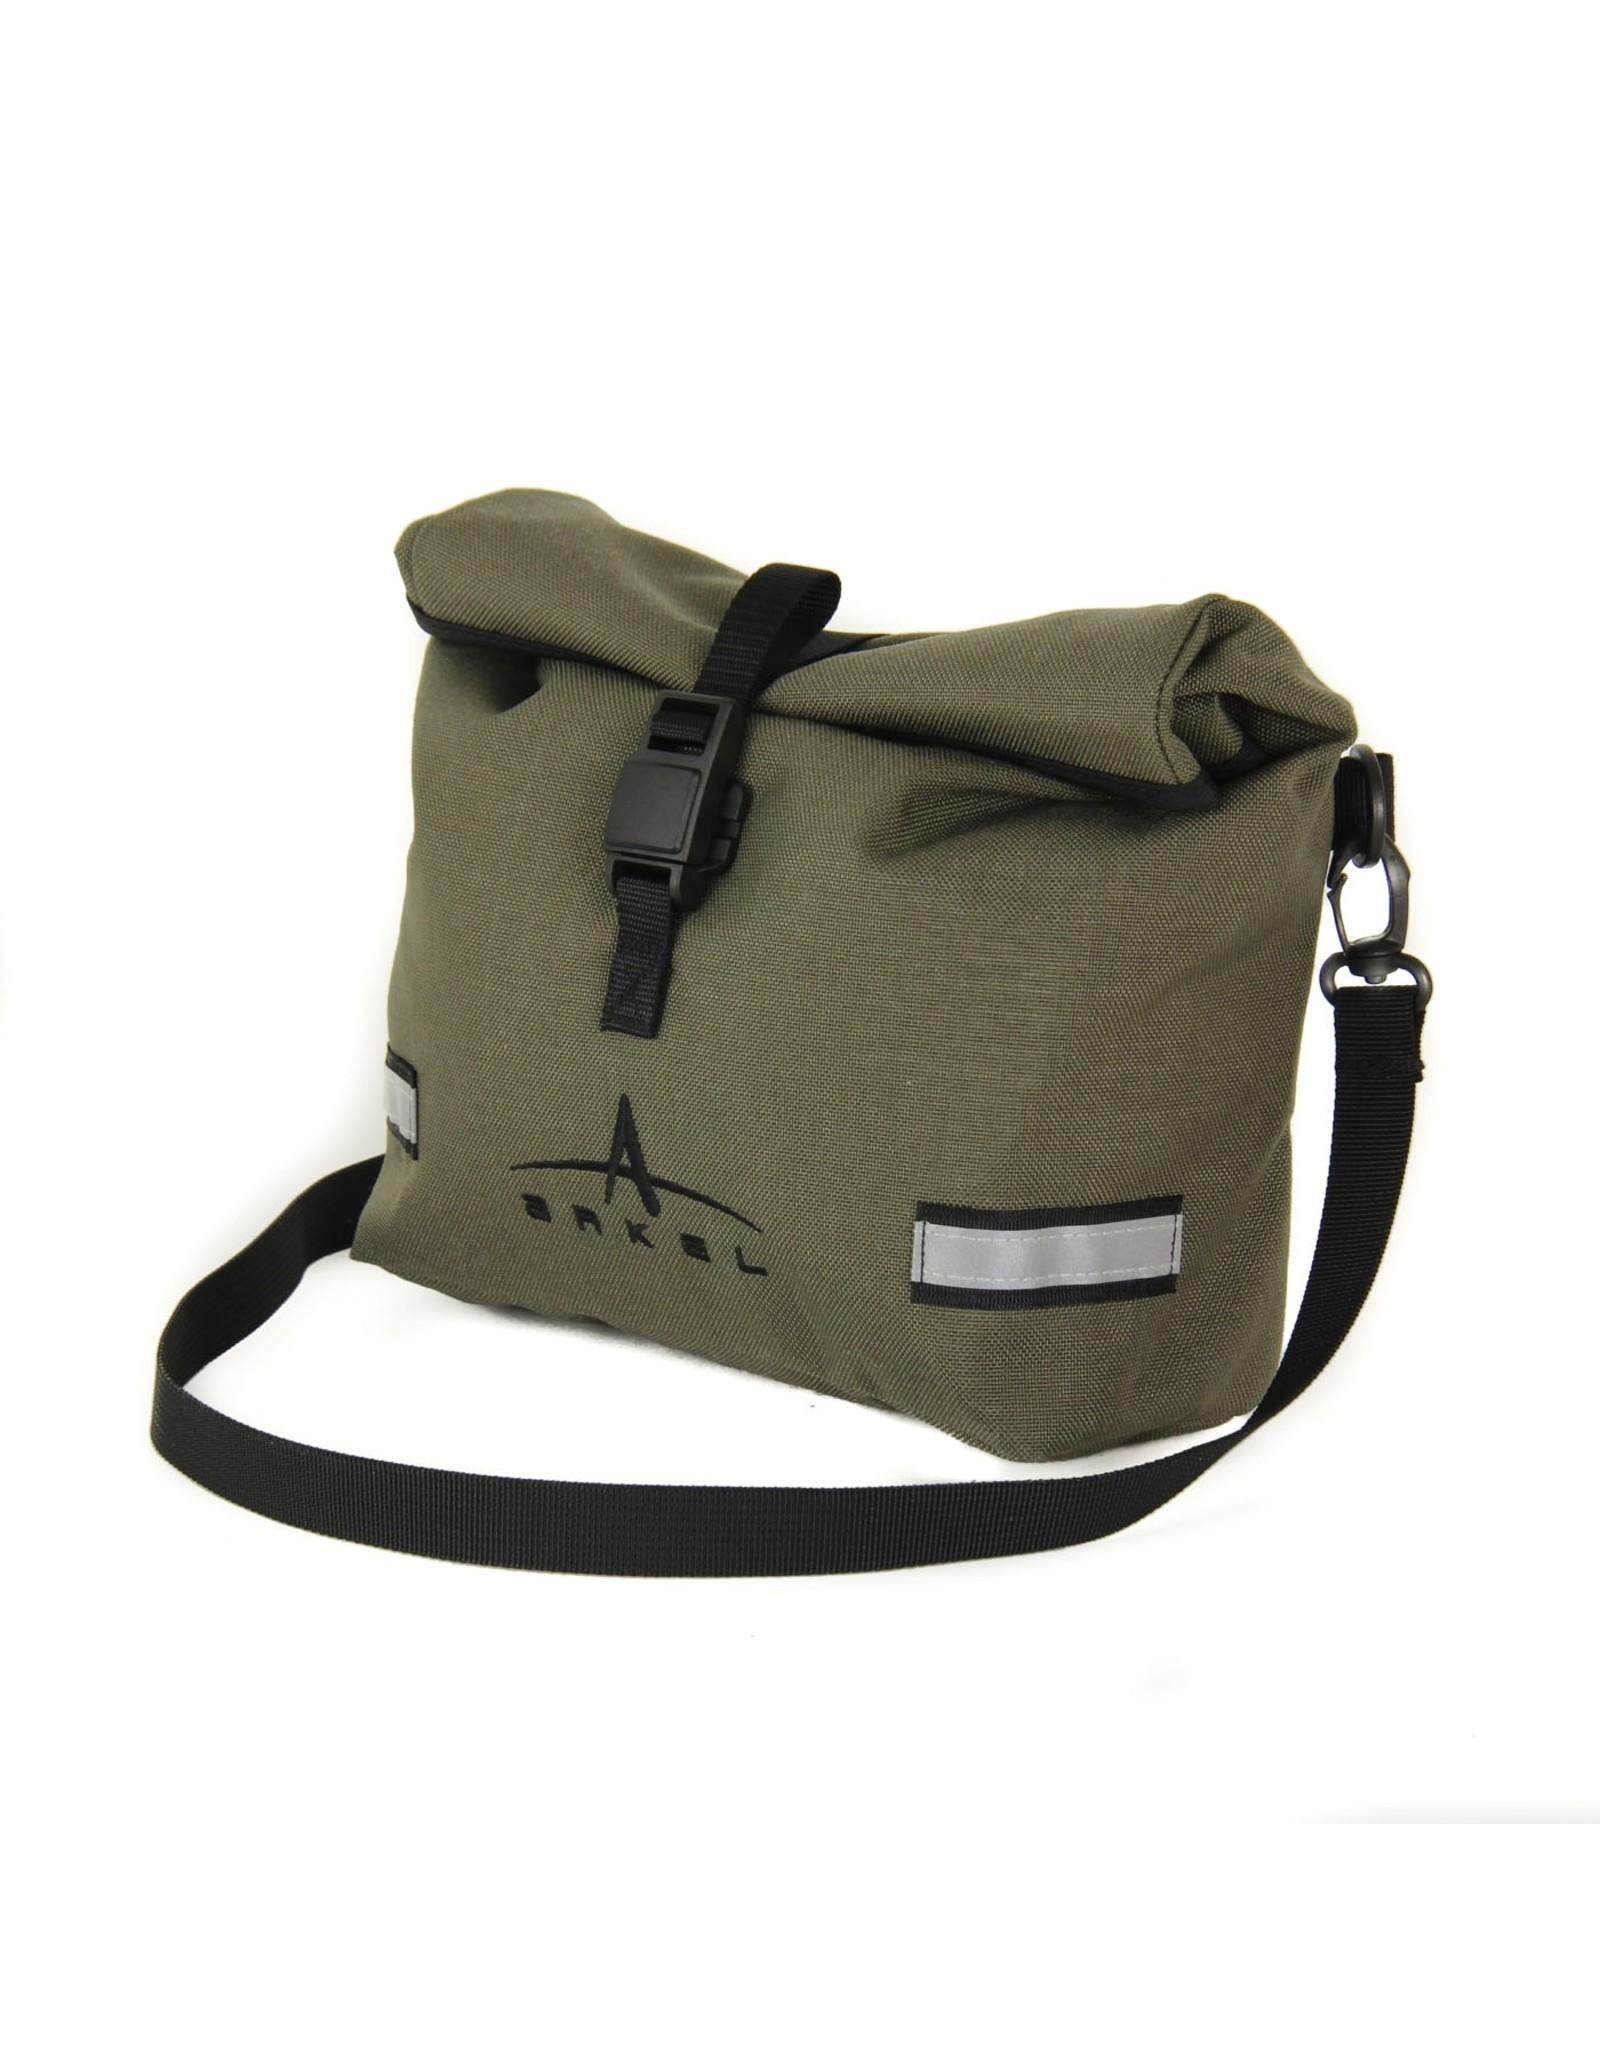 ARKEL Arkel Signature BB Handlebar Bag Olive